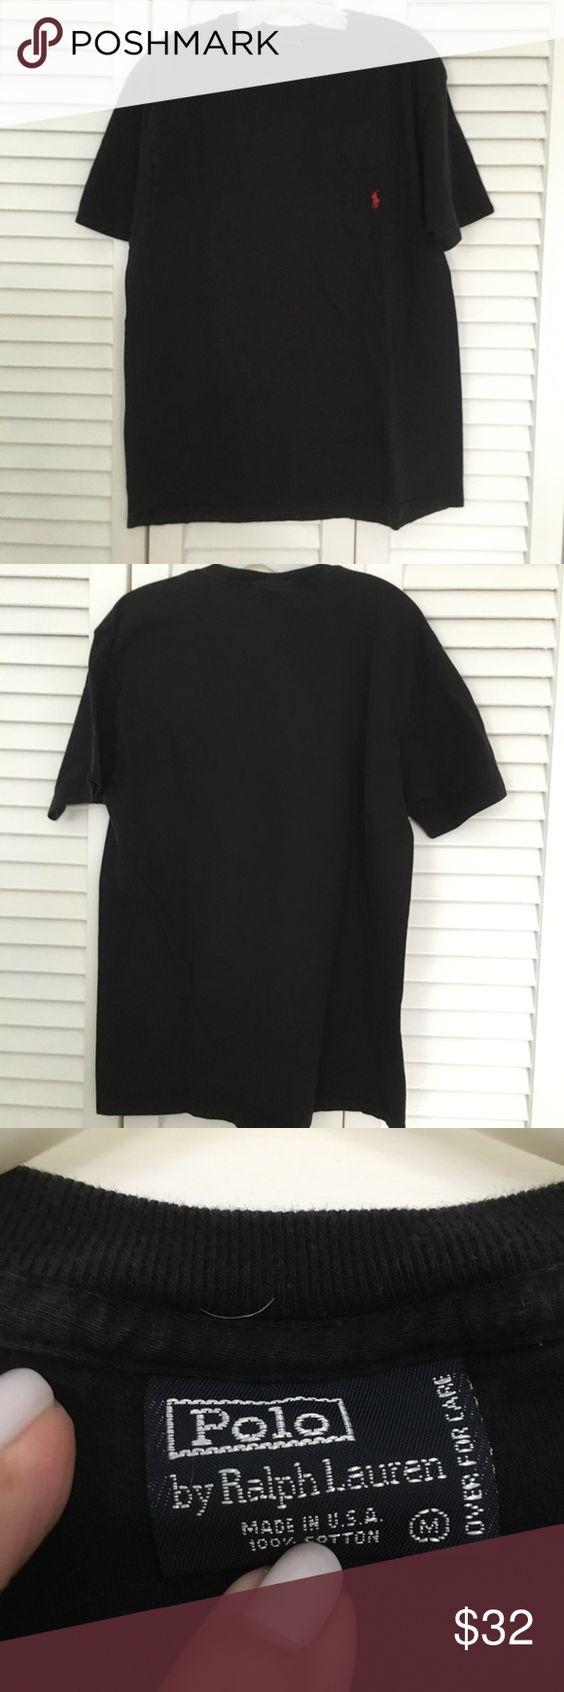 Men's polo Ralph Lauren tee Mens Ralph Lauren Polo tee shirt with pocket. Color Black Size M Polo by Ralph Lauren Shirts Tees - Short Sleeve